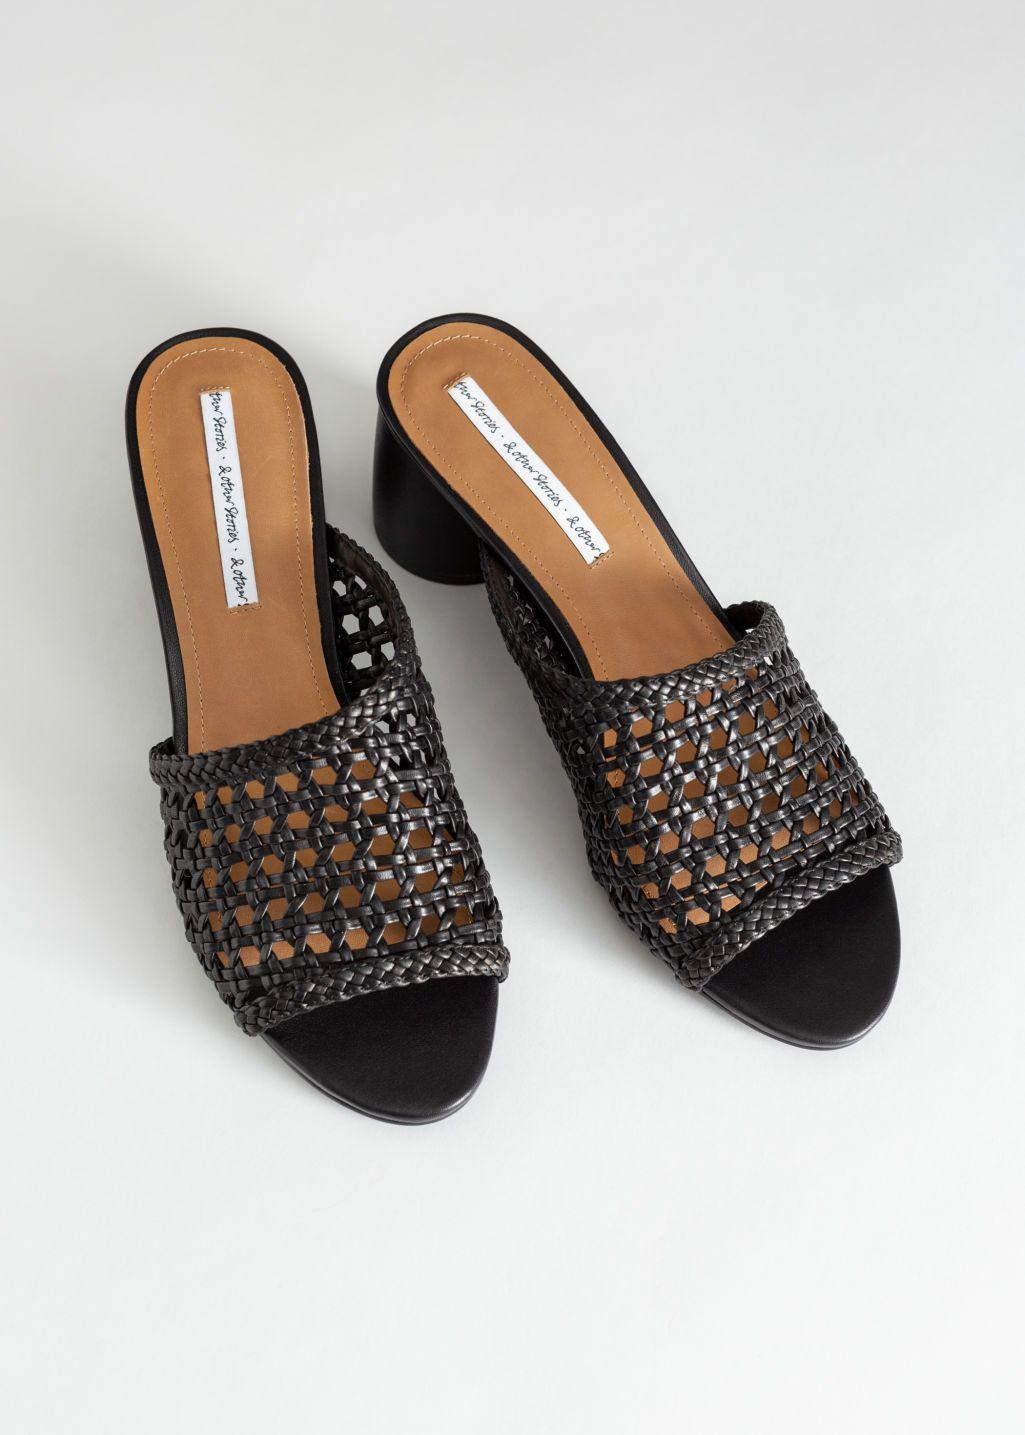 Woven Leather Heeled Sandals | Skor